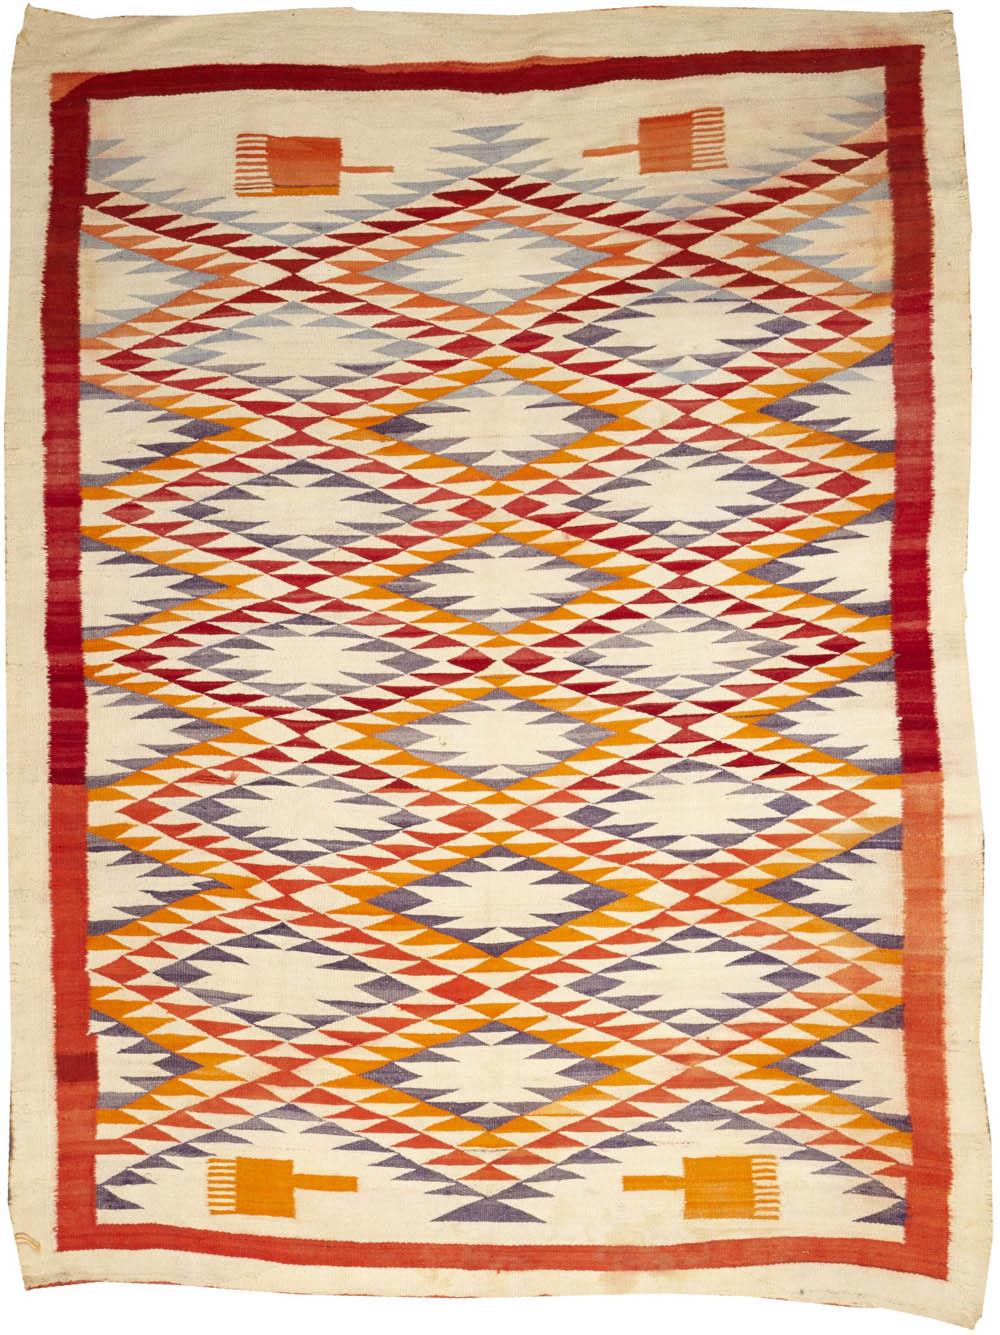 Lot 2233 - A Navajo transitional rug